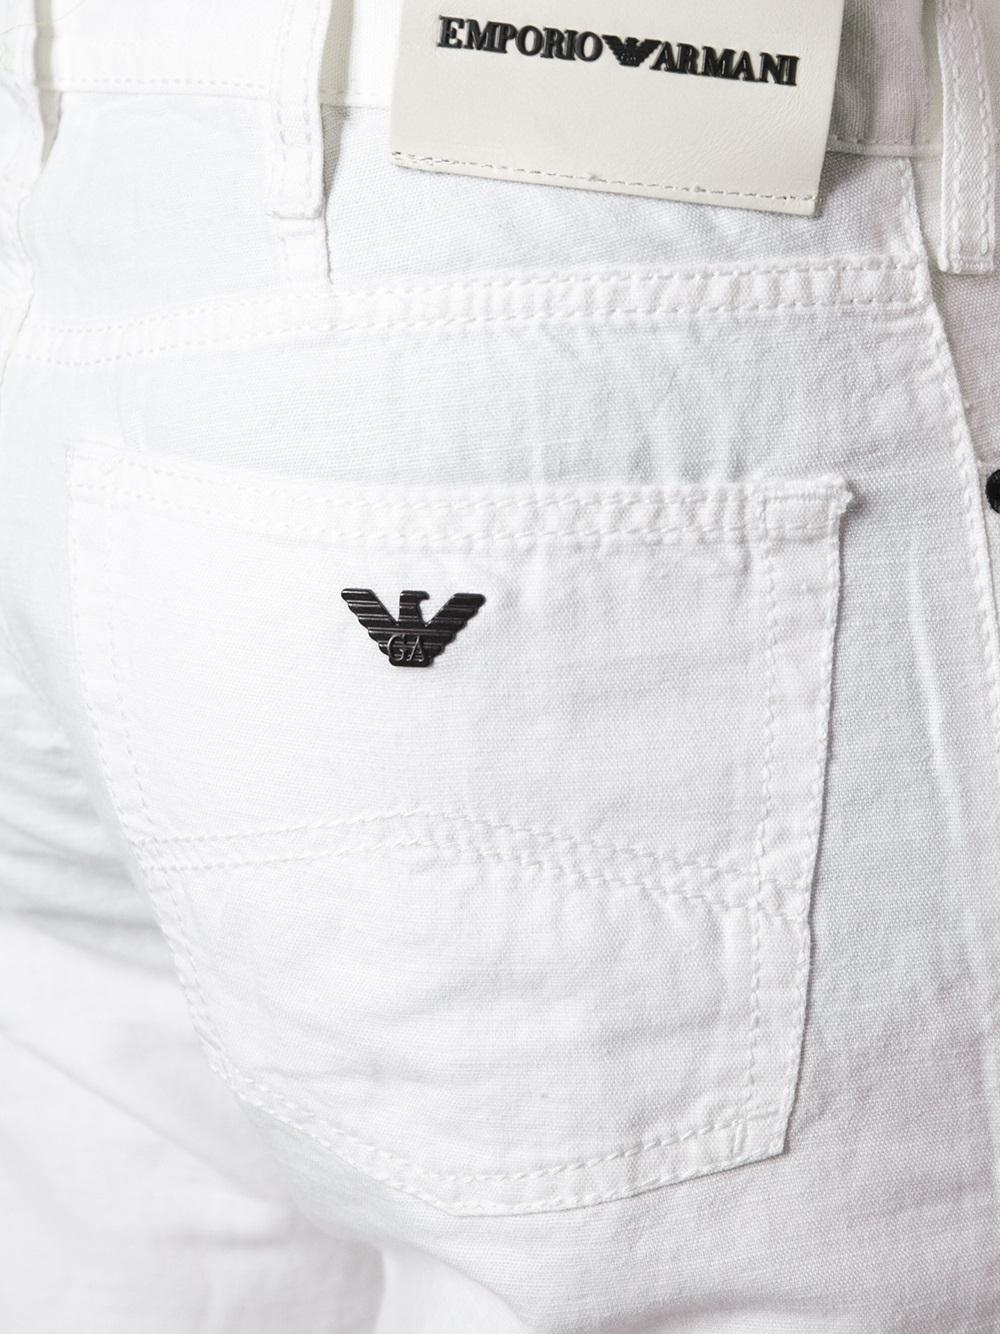 Armani Jeans Shirts For Men